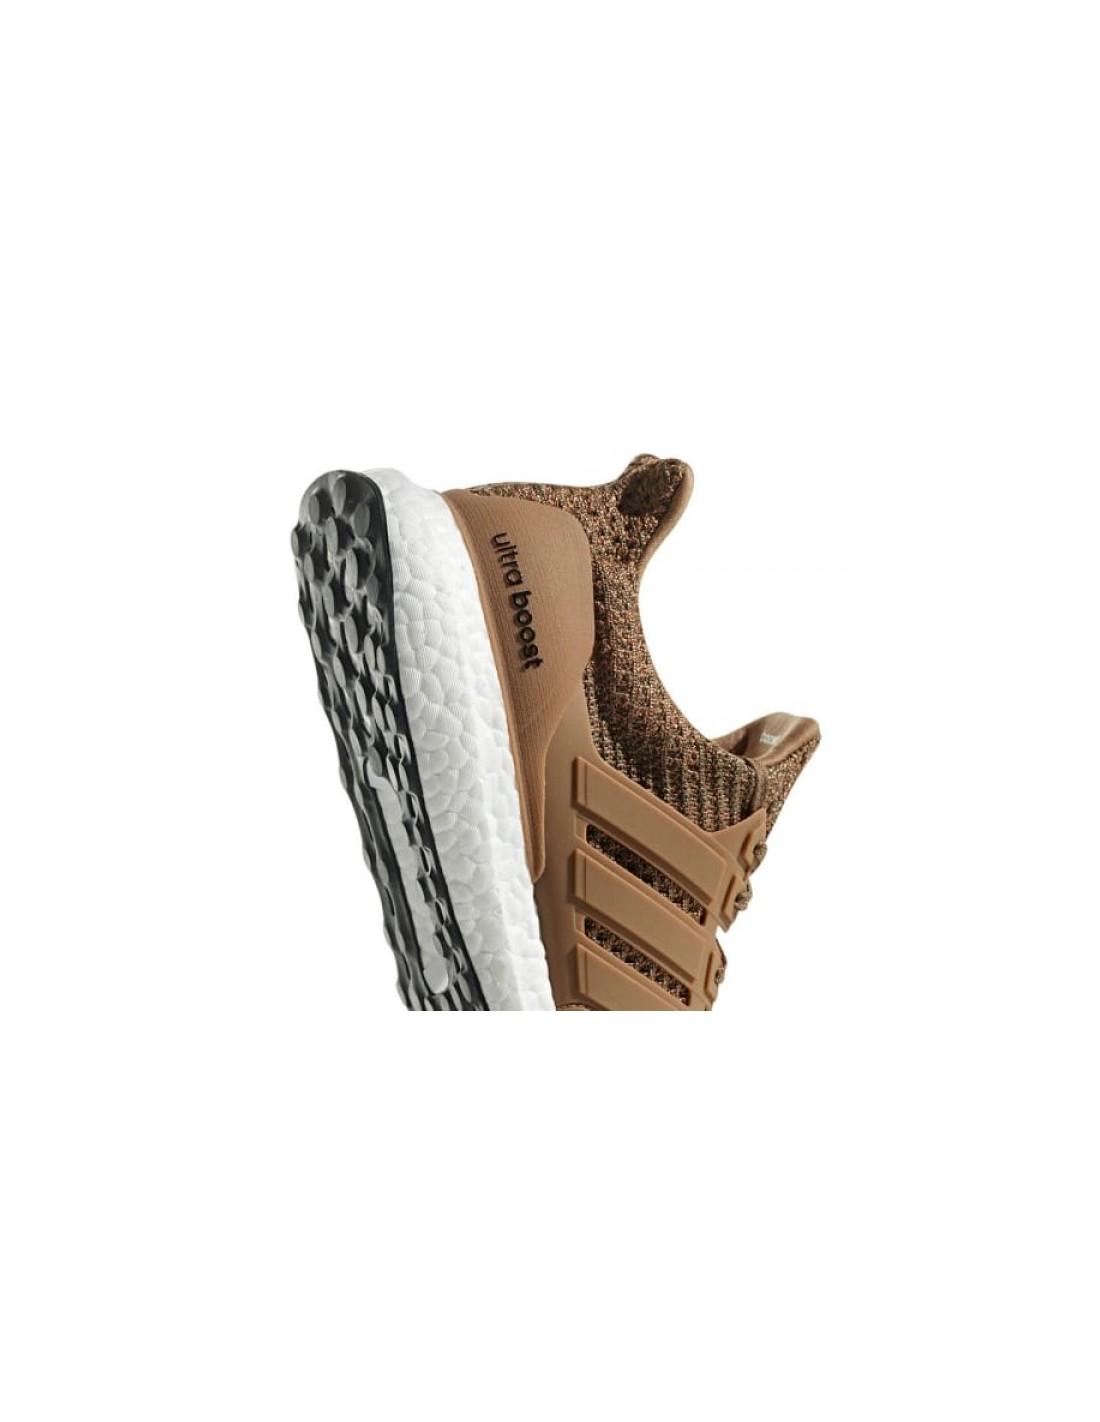 wholesale dealer c7cdb 1d917 Adidas Originals Ultra Boost Rawdes CM8118